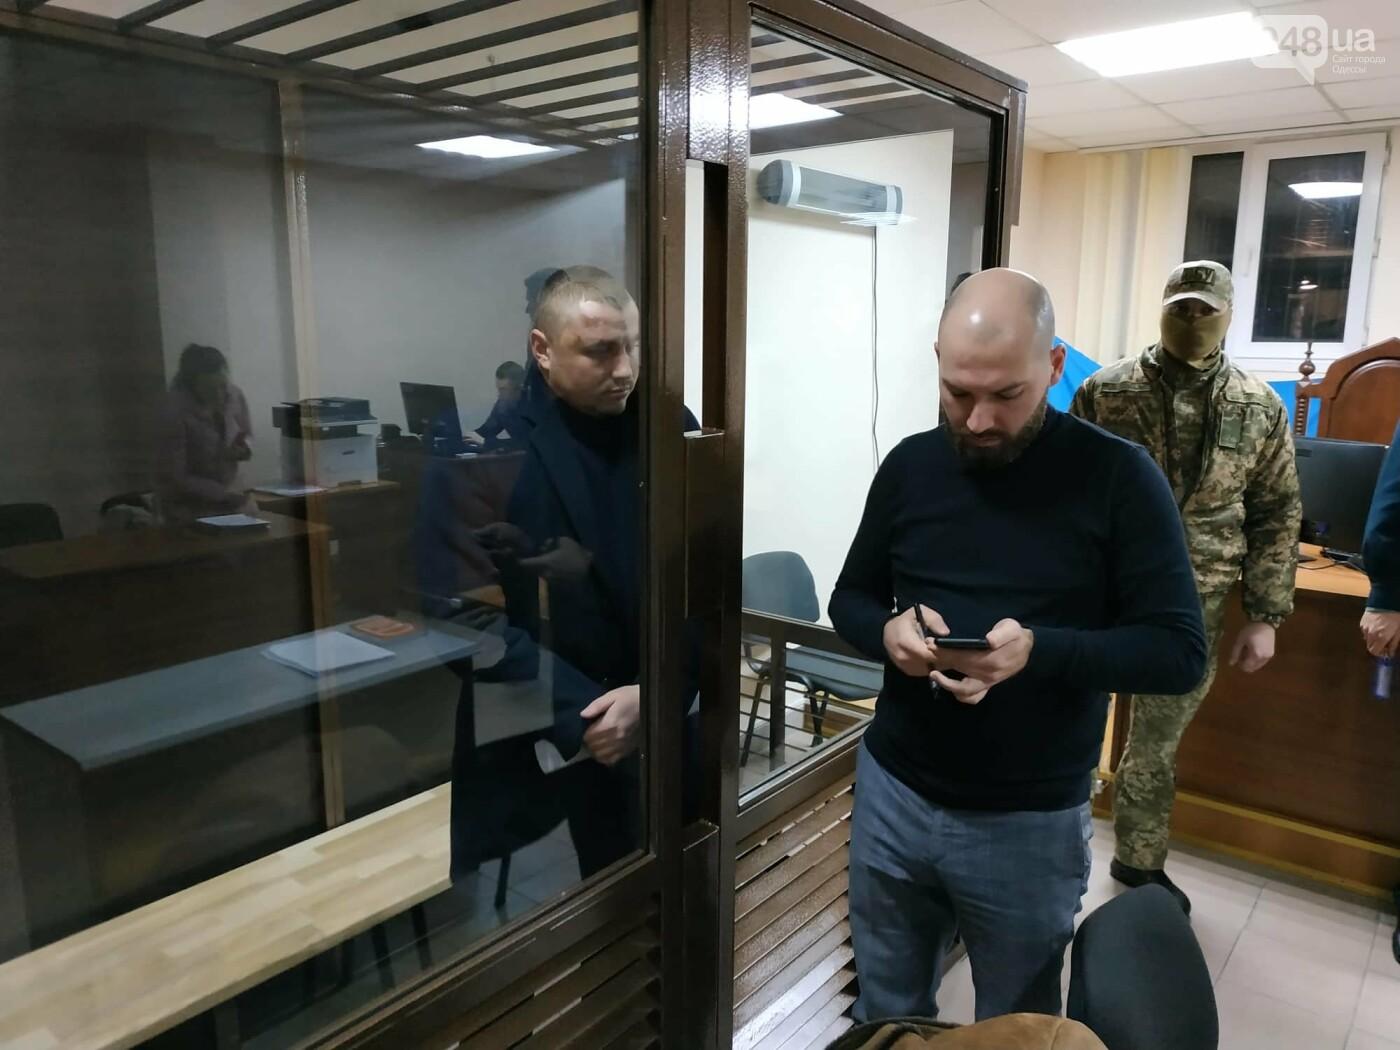 Одесскому псевдо-активисту избрали меру пресечения, - ФОТО, фото-1, Фото: Александр Жирносенко